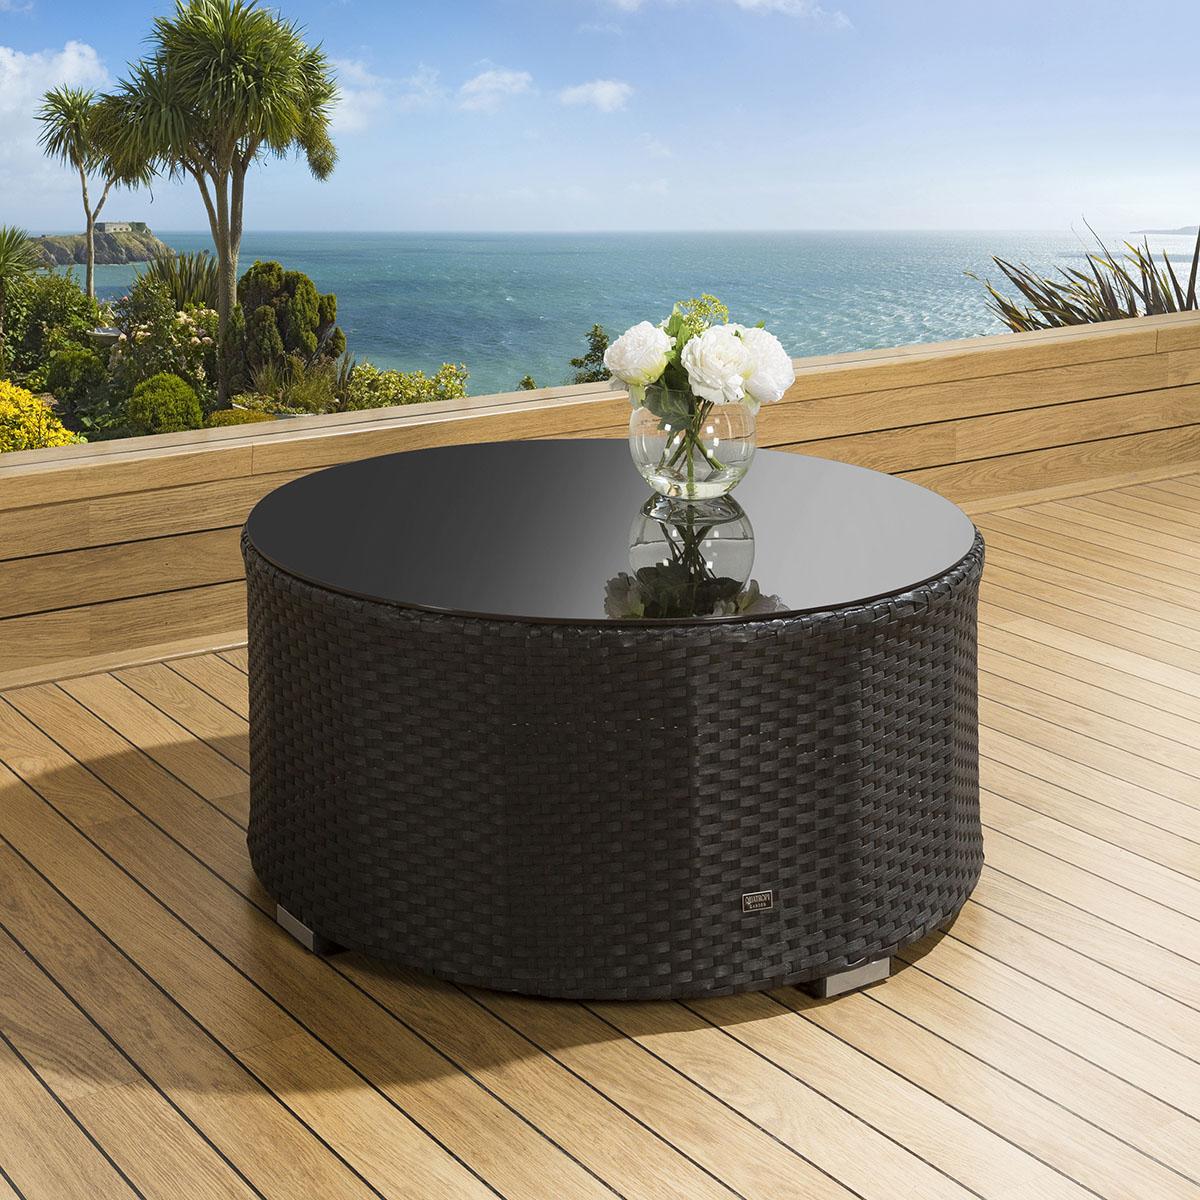 Rattan Round Coffee Table Uk: Luxury Outdoor Garden Round Coffee Table Black Rattan